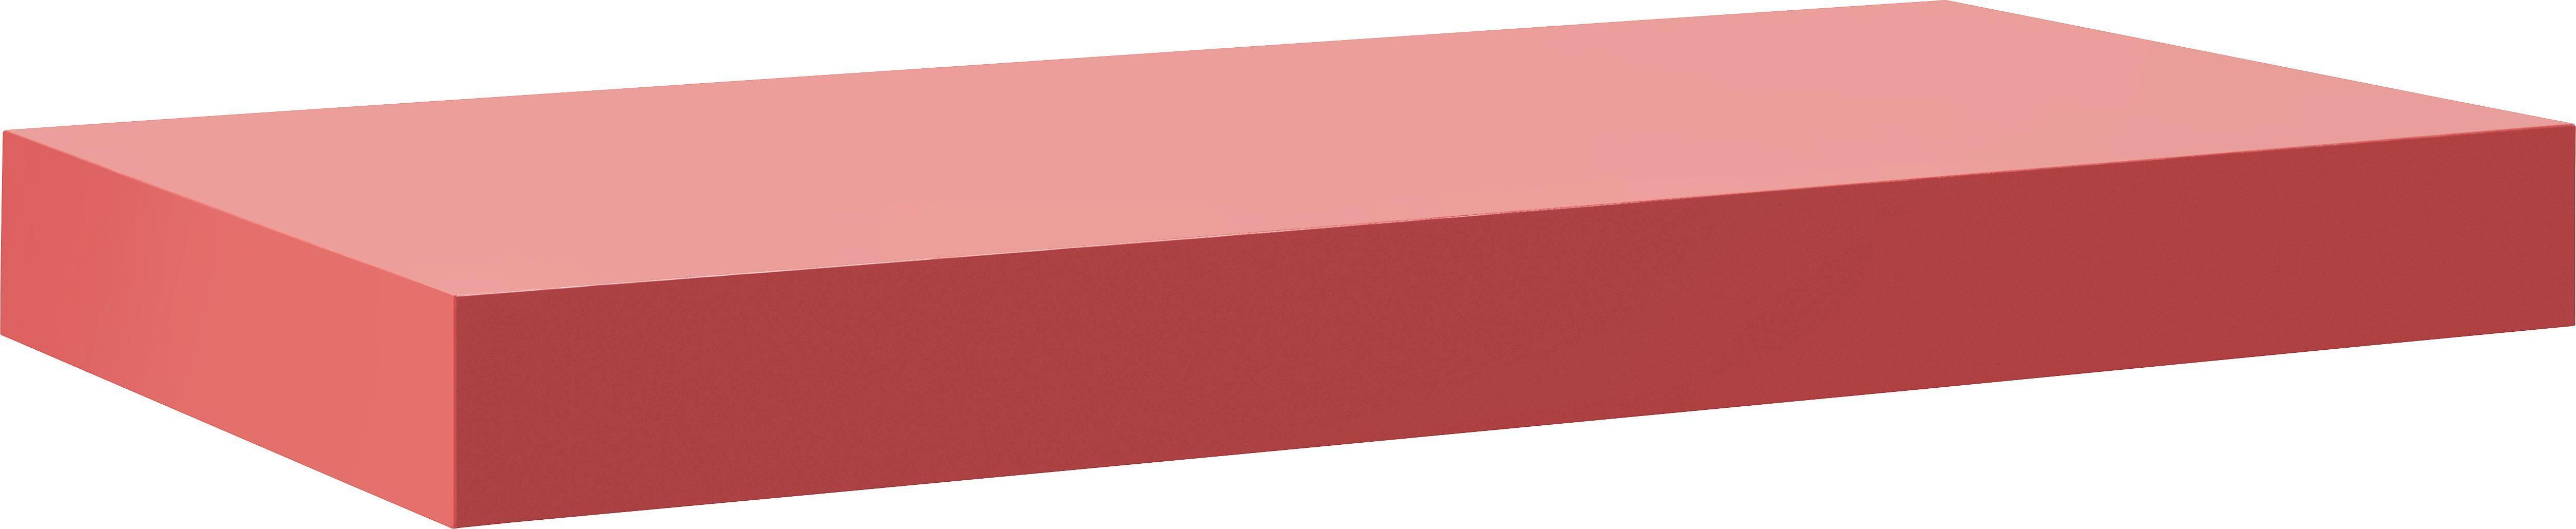 Wandboard in Rot - Rot, Holzwerkstoff (50/44/24cm) - MÖMAX modern living